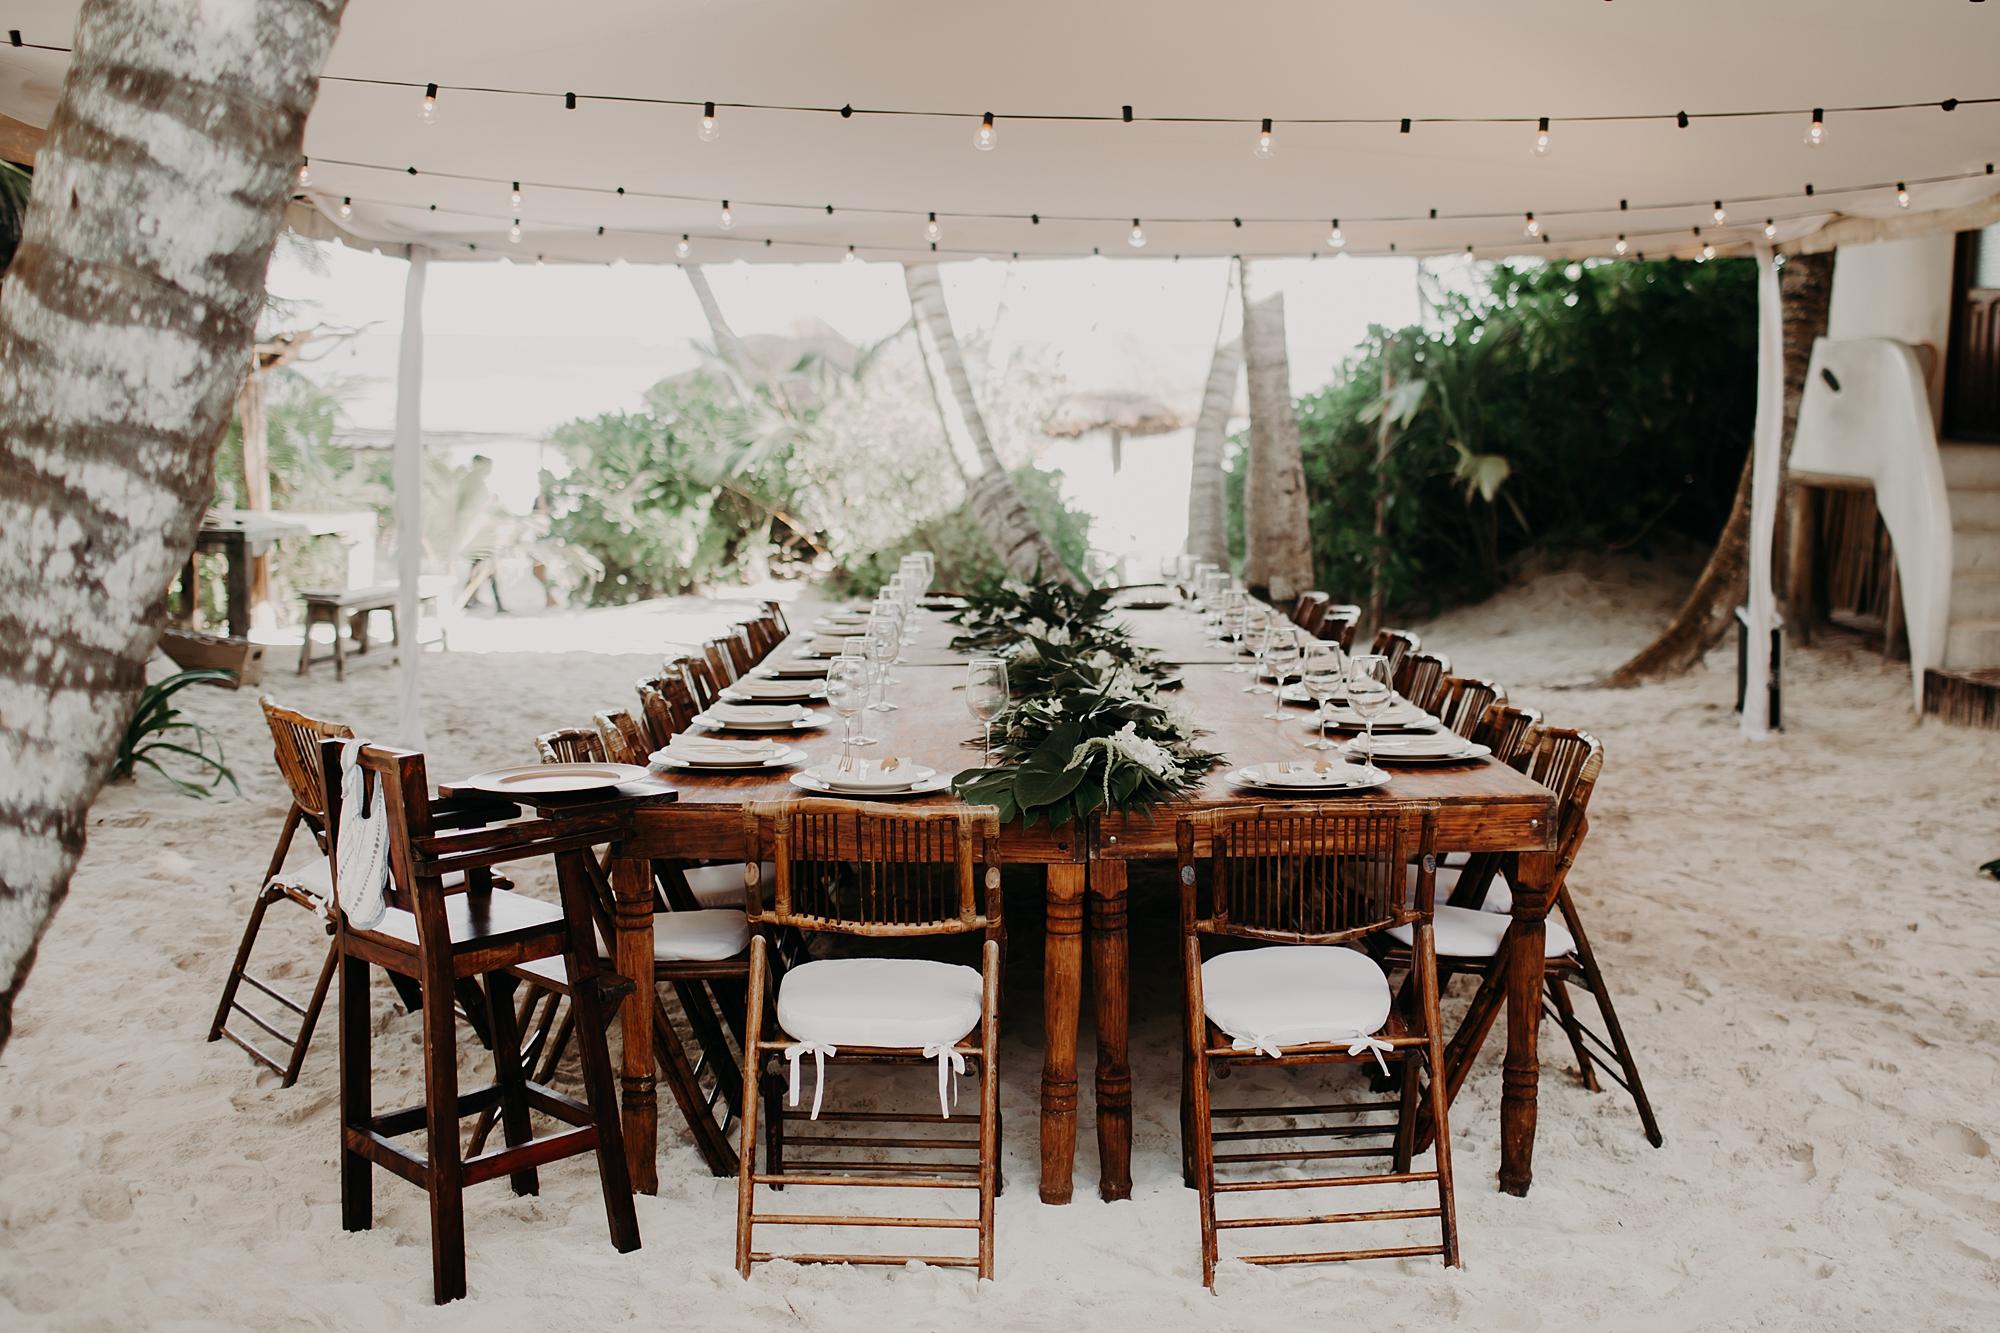 Danielle-San-Antonio-Wedding-Photographer-47_WEB.jpg